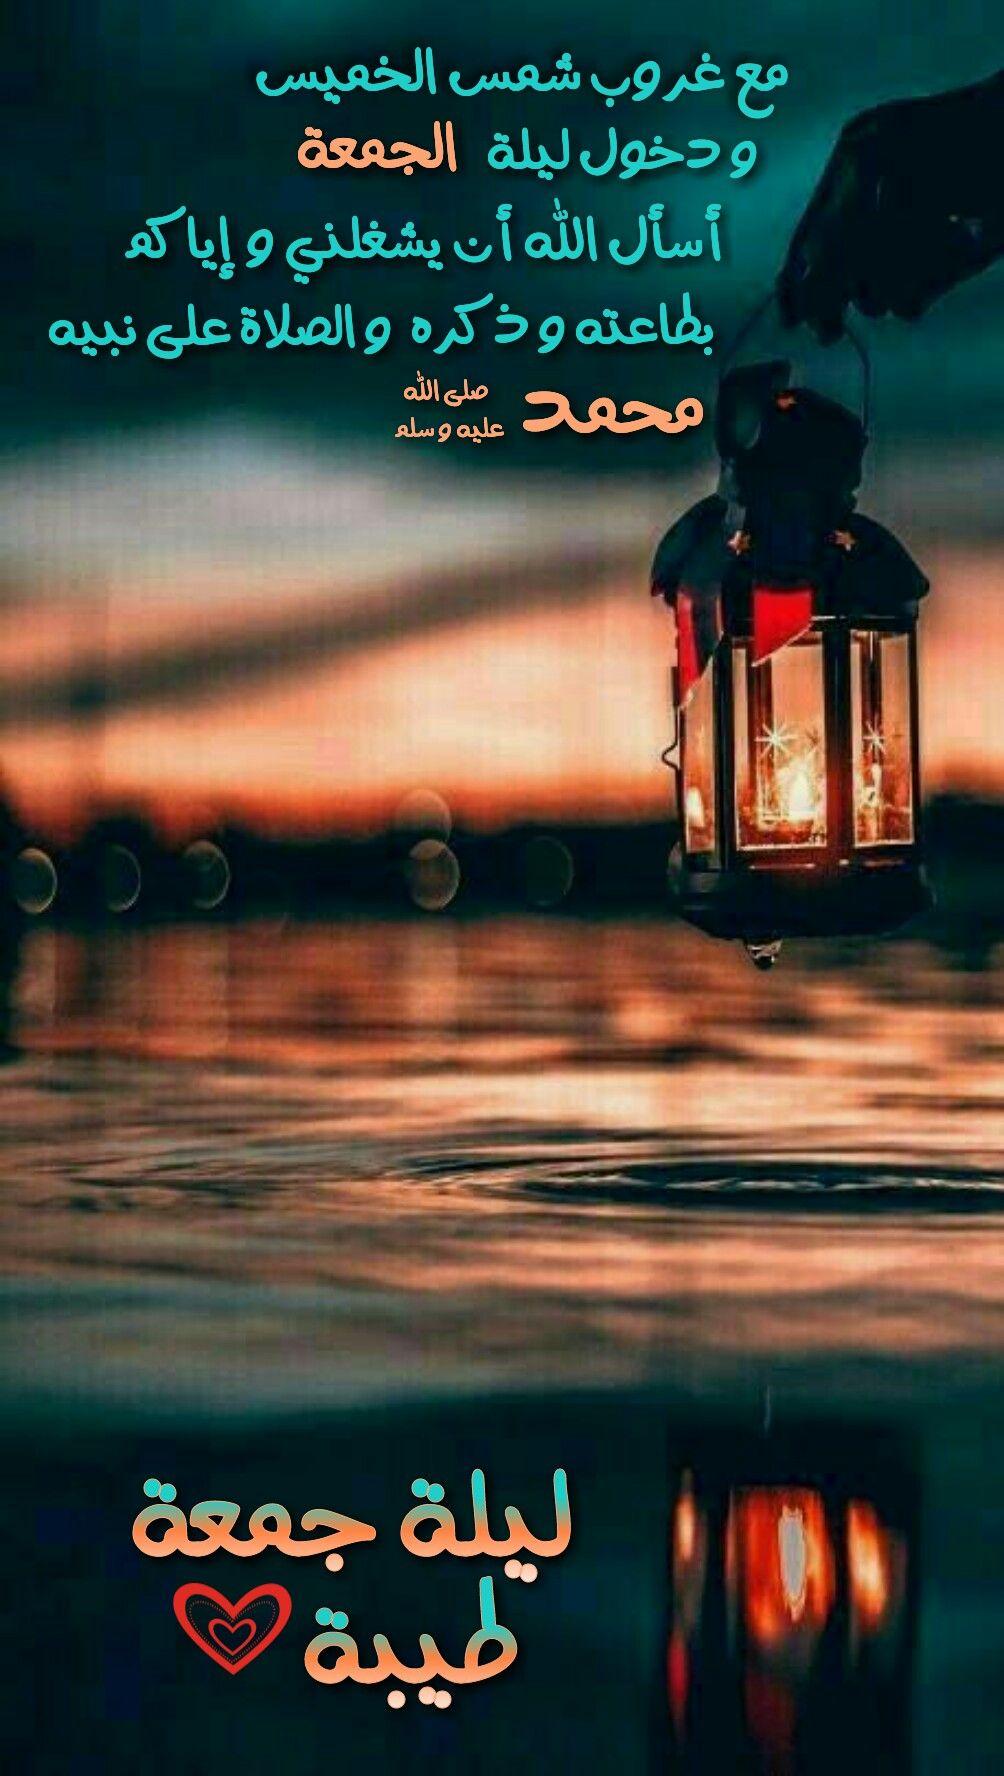 Pin By Ranya Anis On صباحيات و مسائيات Arabic Love Quotes Poster Movie Posters